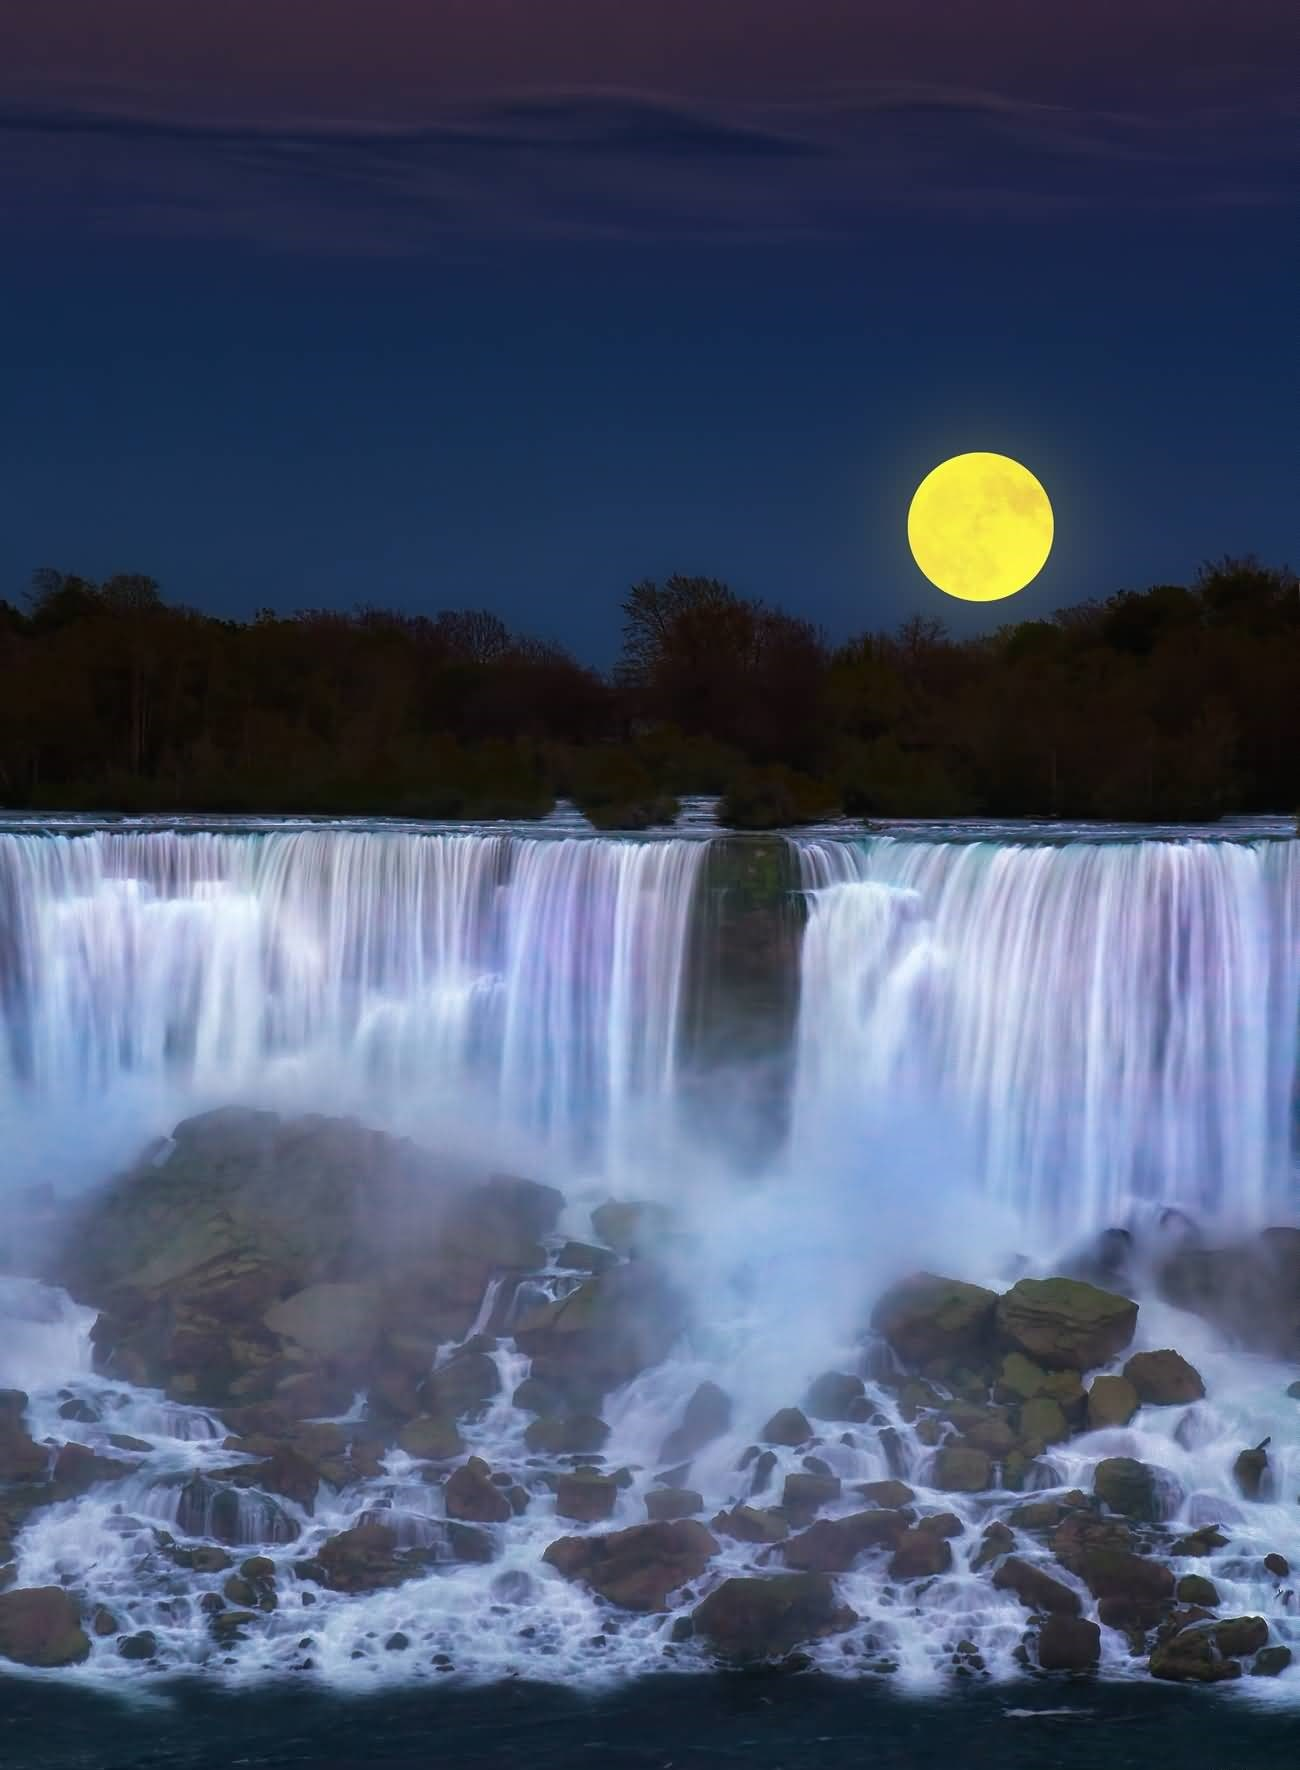 Niagara Water Falls Desktop Wallpaper Niagara Falls Hd Wallpapers 7wallpapers Net